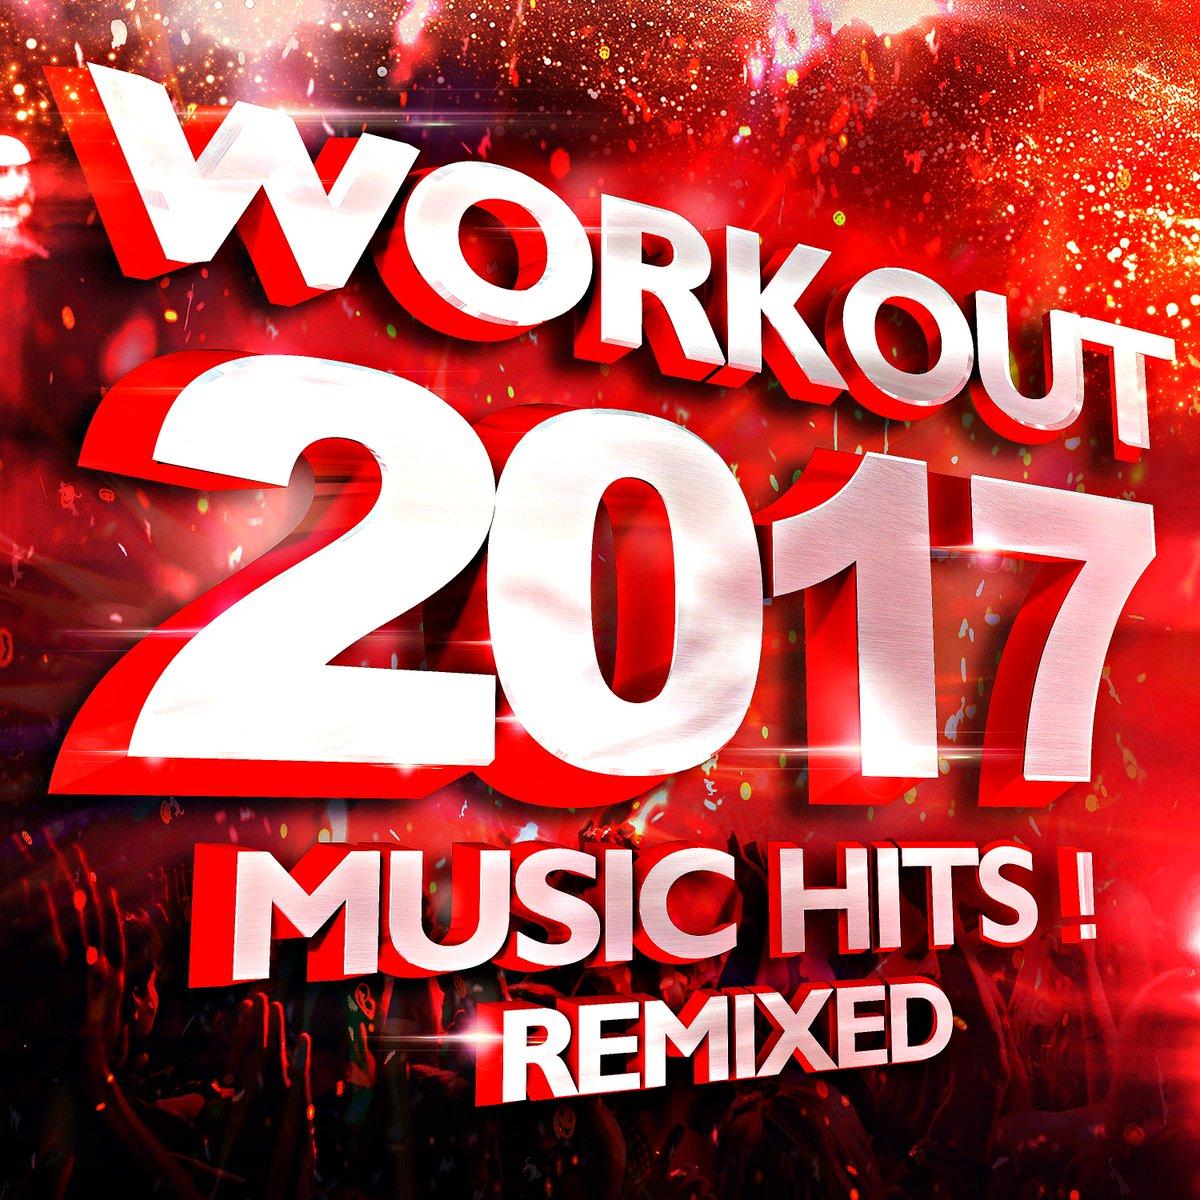 Workout 2017 Music Hits! Remixed Avail @ ITUNES under Workout Remix Factory #SPOTIFY #deezer #WorkoutRemixFactory #WorkoutRemix #WorkoutBuddy #fitness #workout #running #WorkOutMusic #Weightloss #Gym #treadmill #exercise #personaltrainer #spinninginstructor #fitnessinstructor<br>http://pic.twitter.com/lpw1mrnPwe